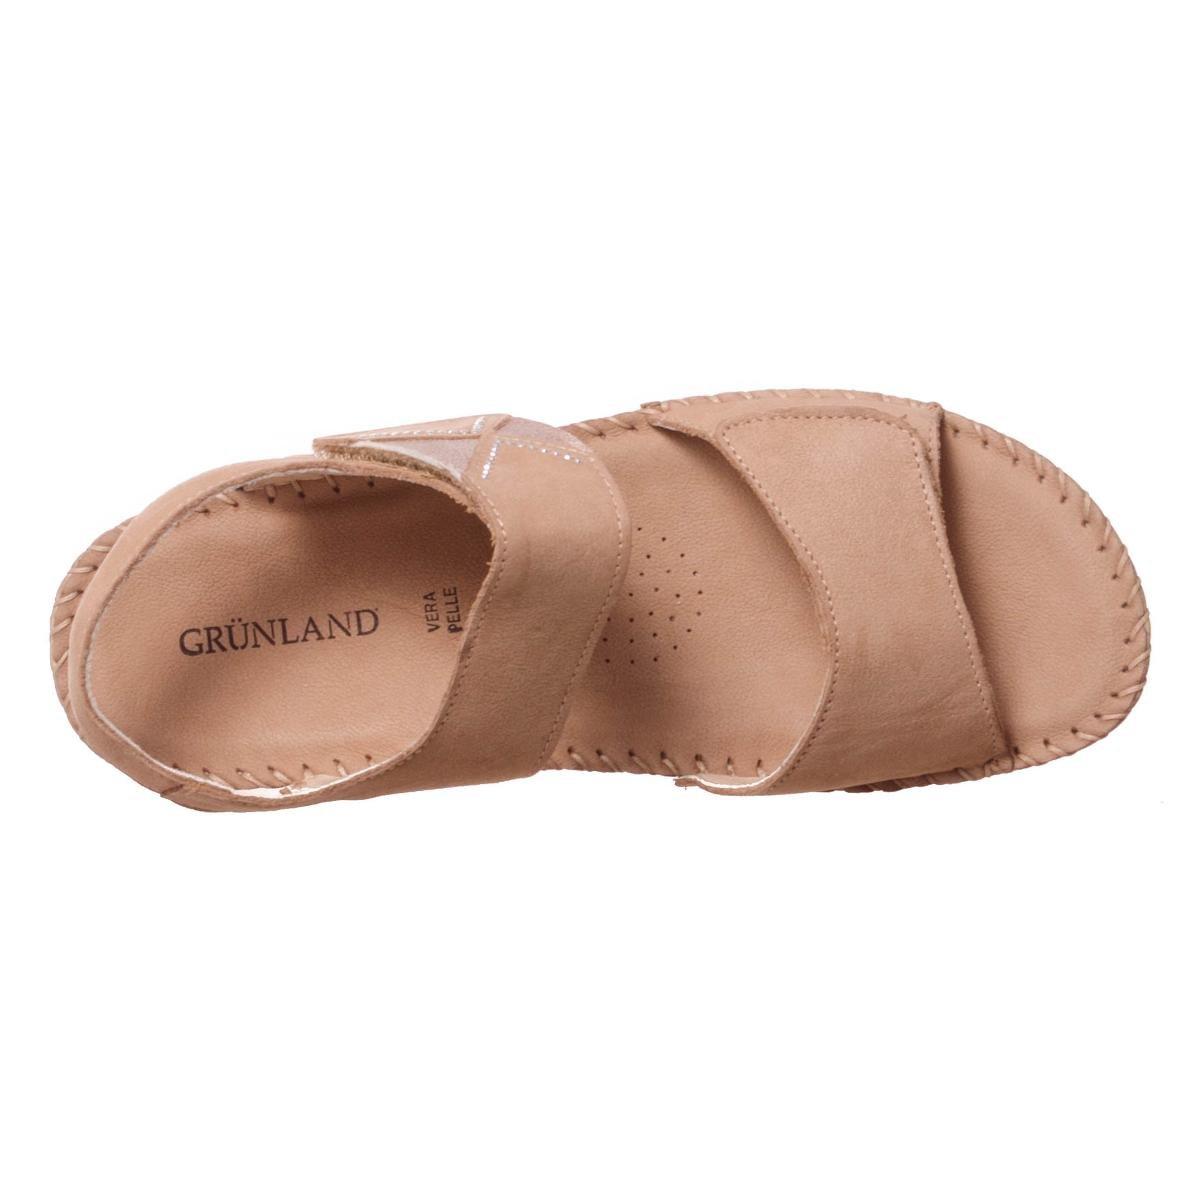 Grunland Saxo donna, pelle liscia, sandali Canapa Canapa sandali 7f4de2